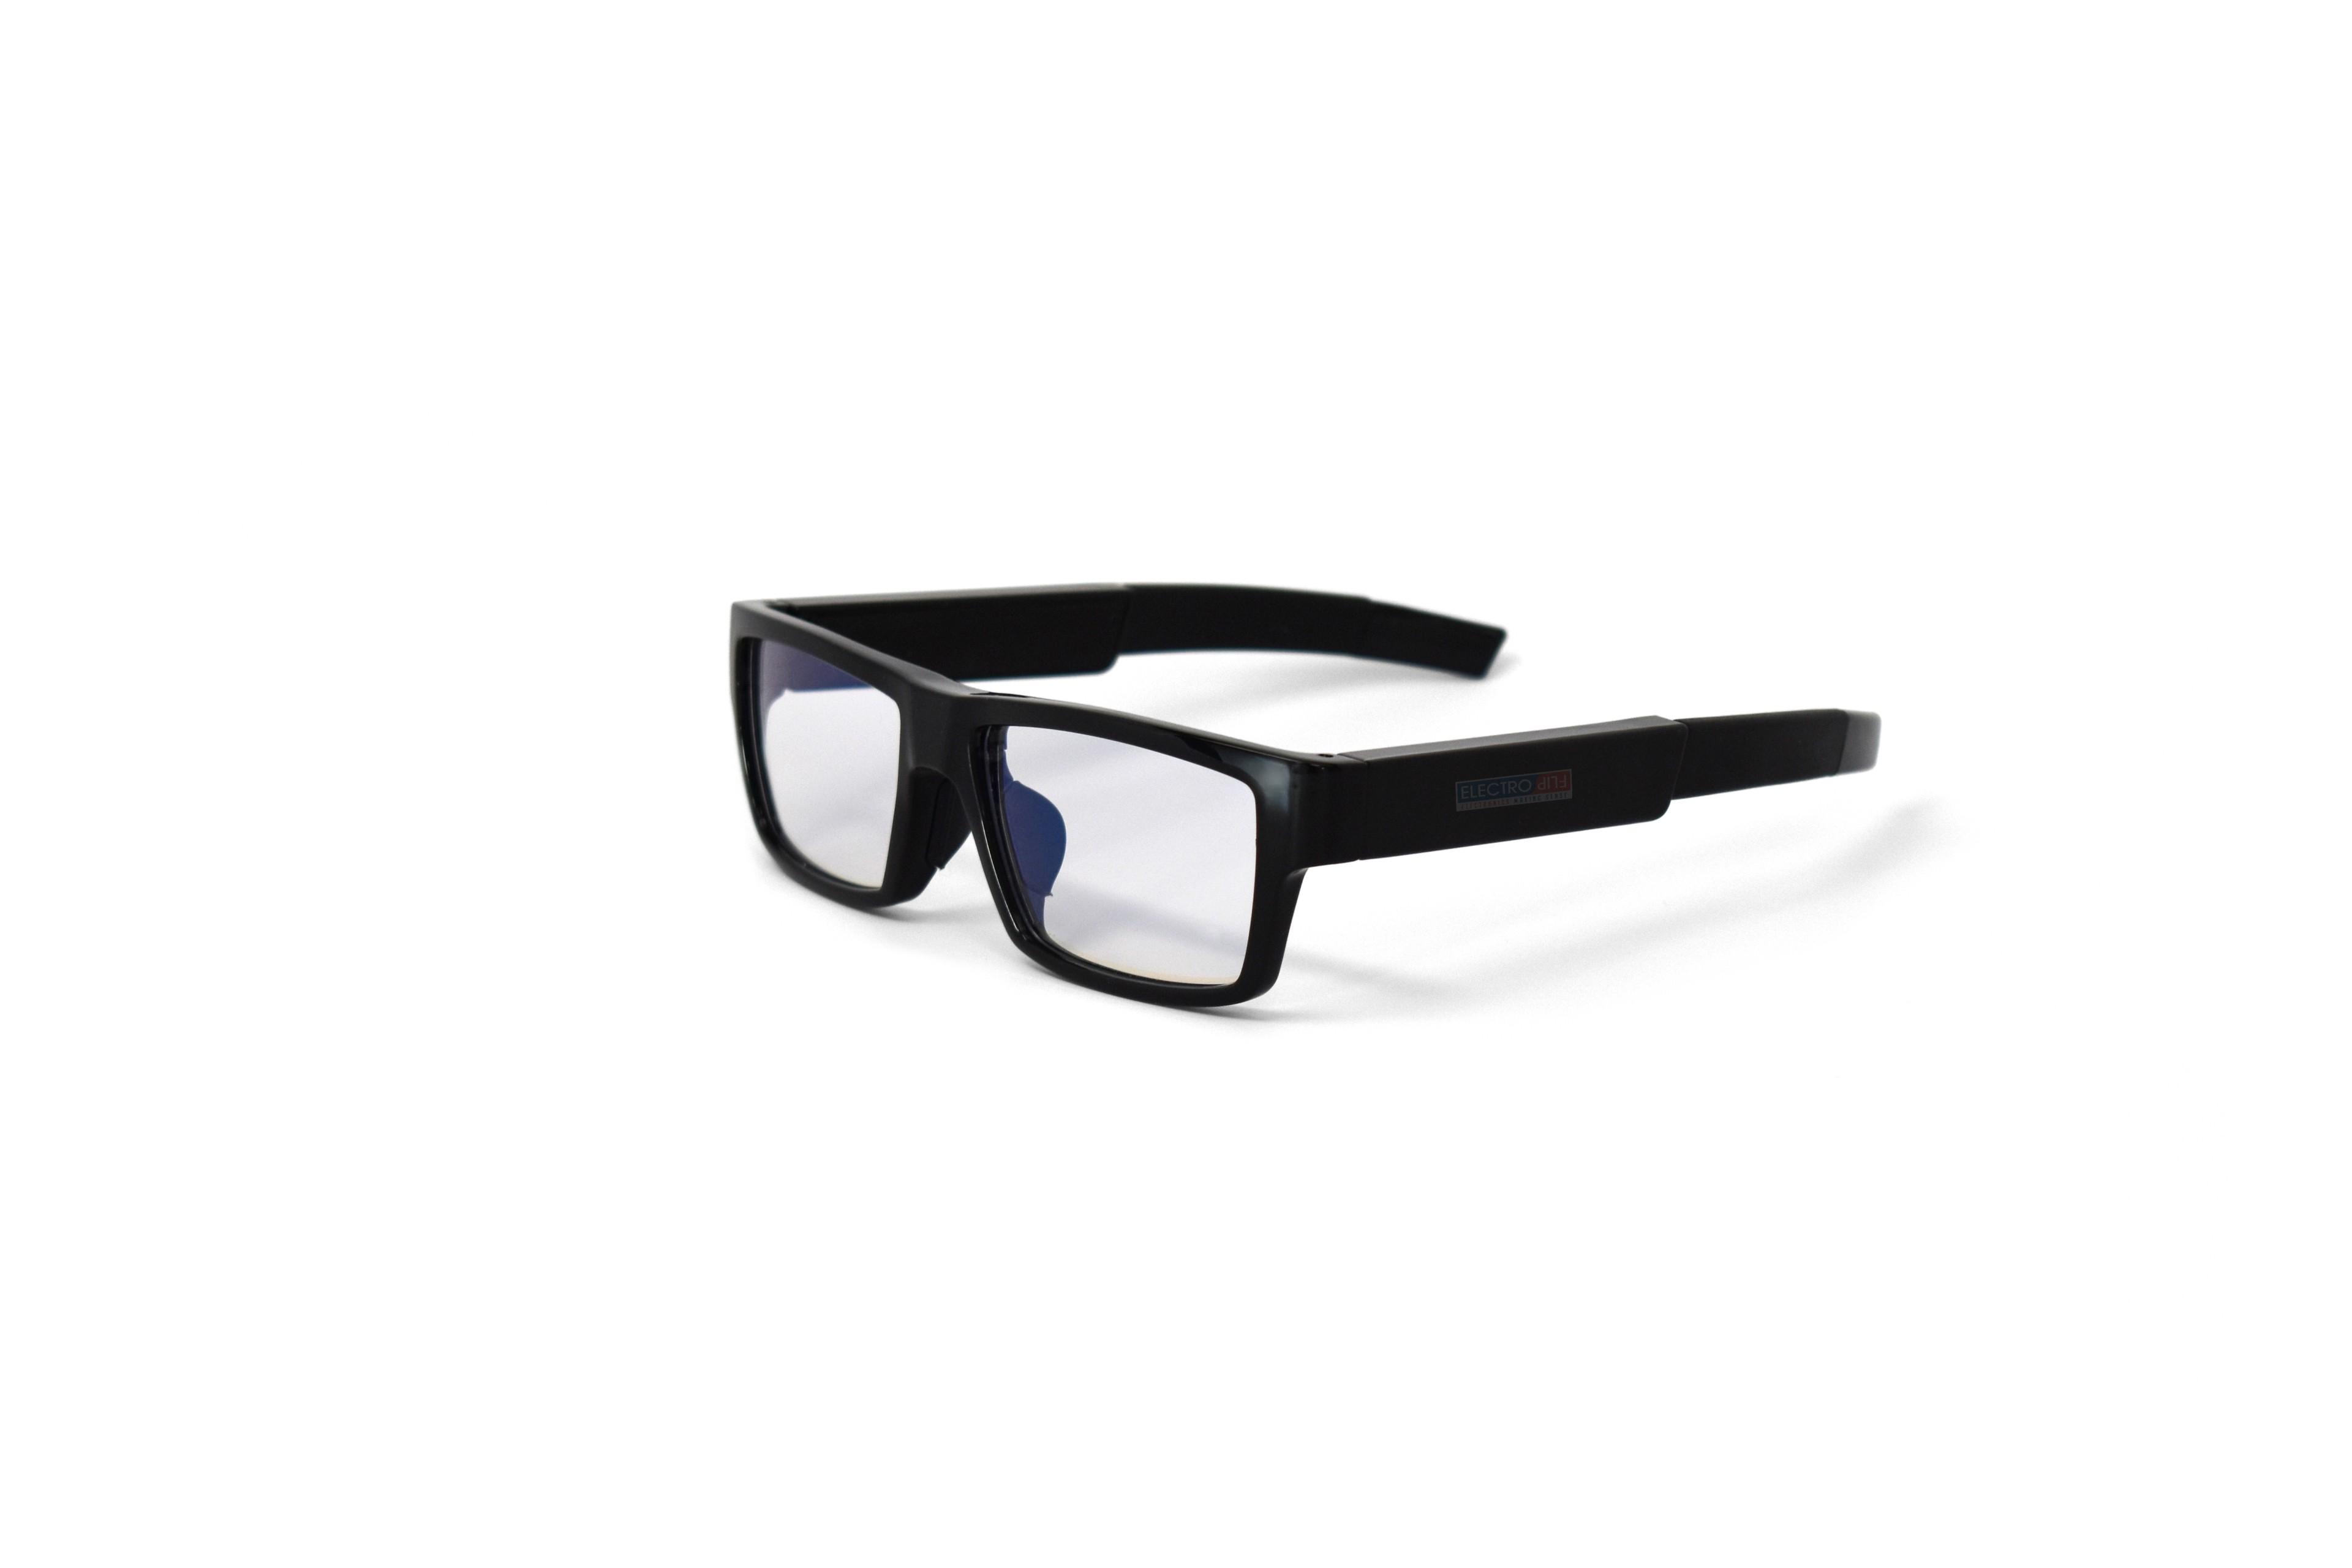 iSee2 - Video/Audio Recording Eyeglasses